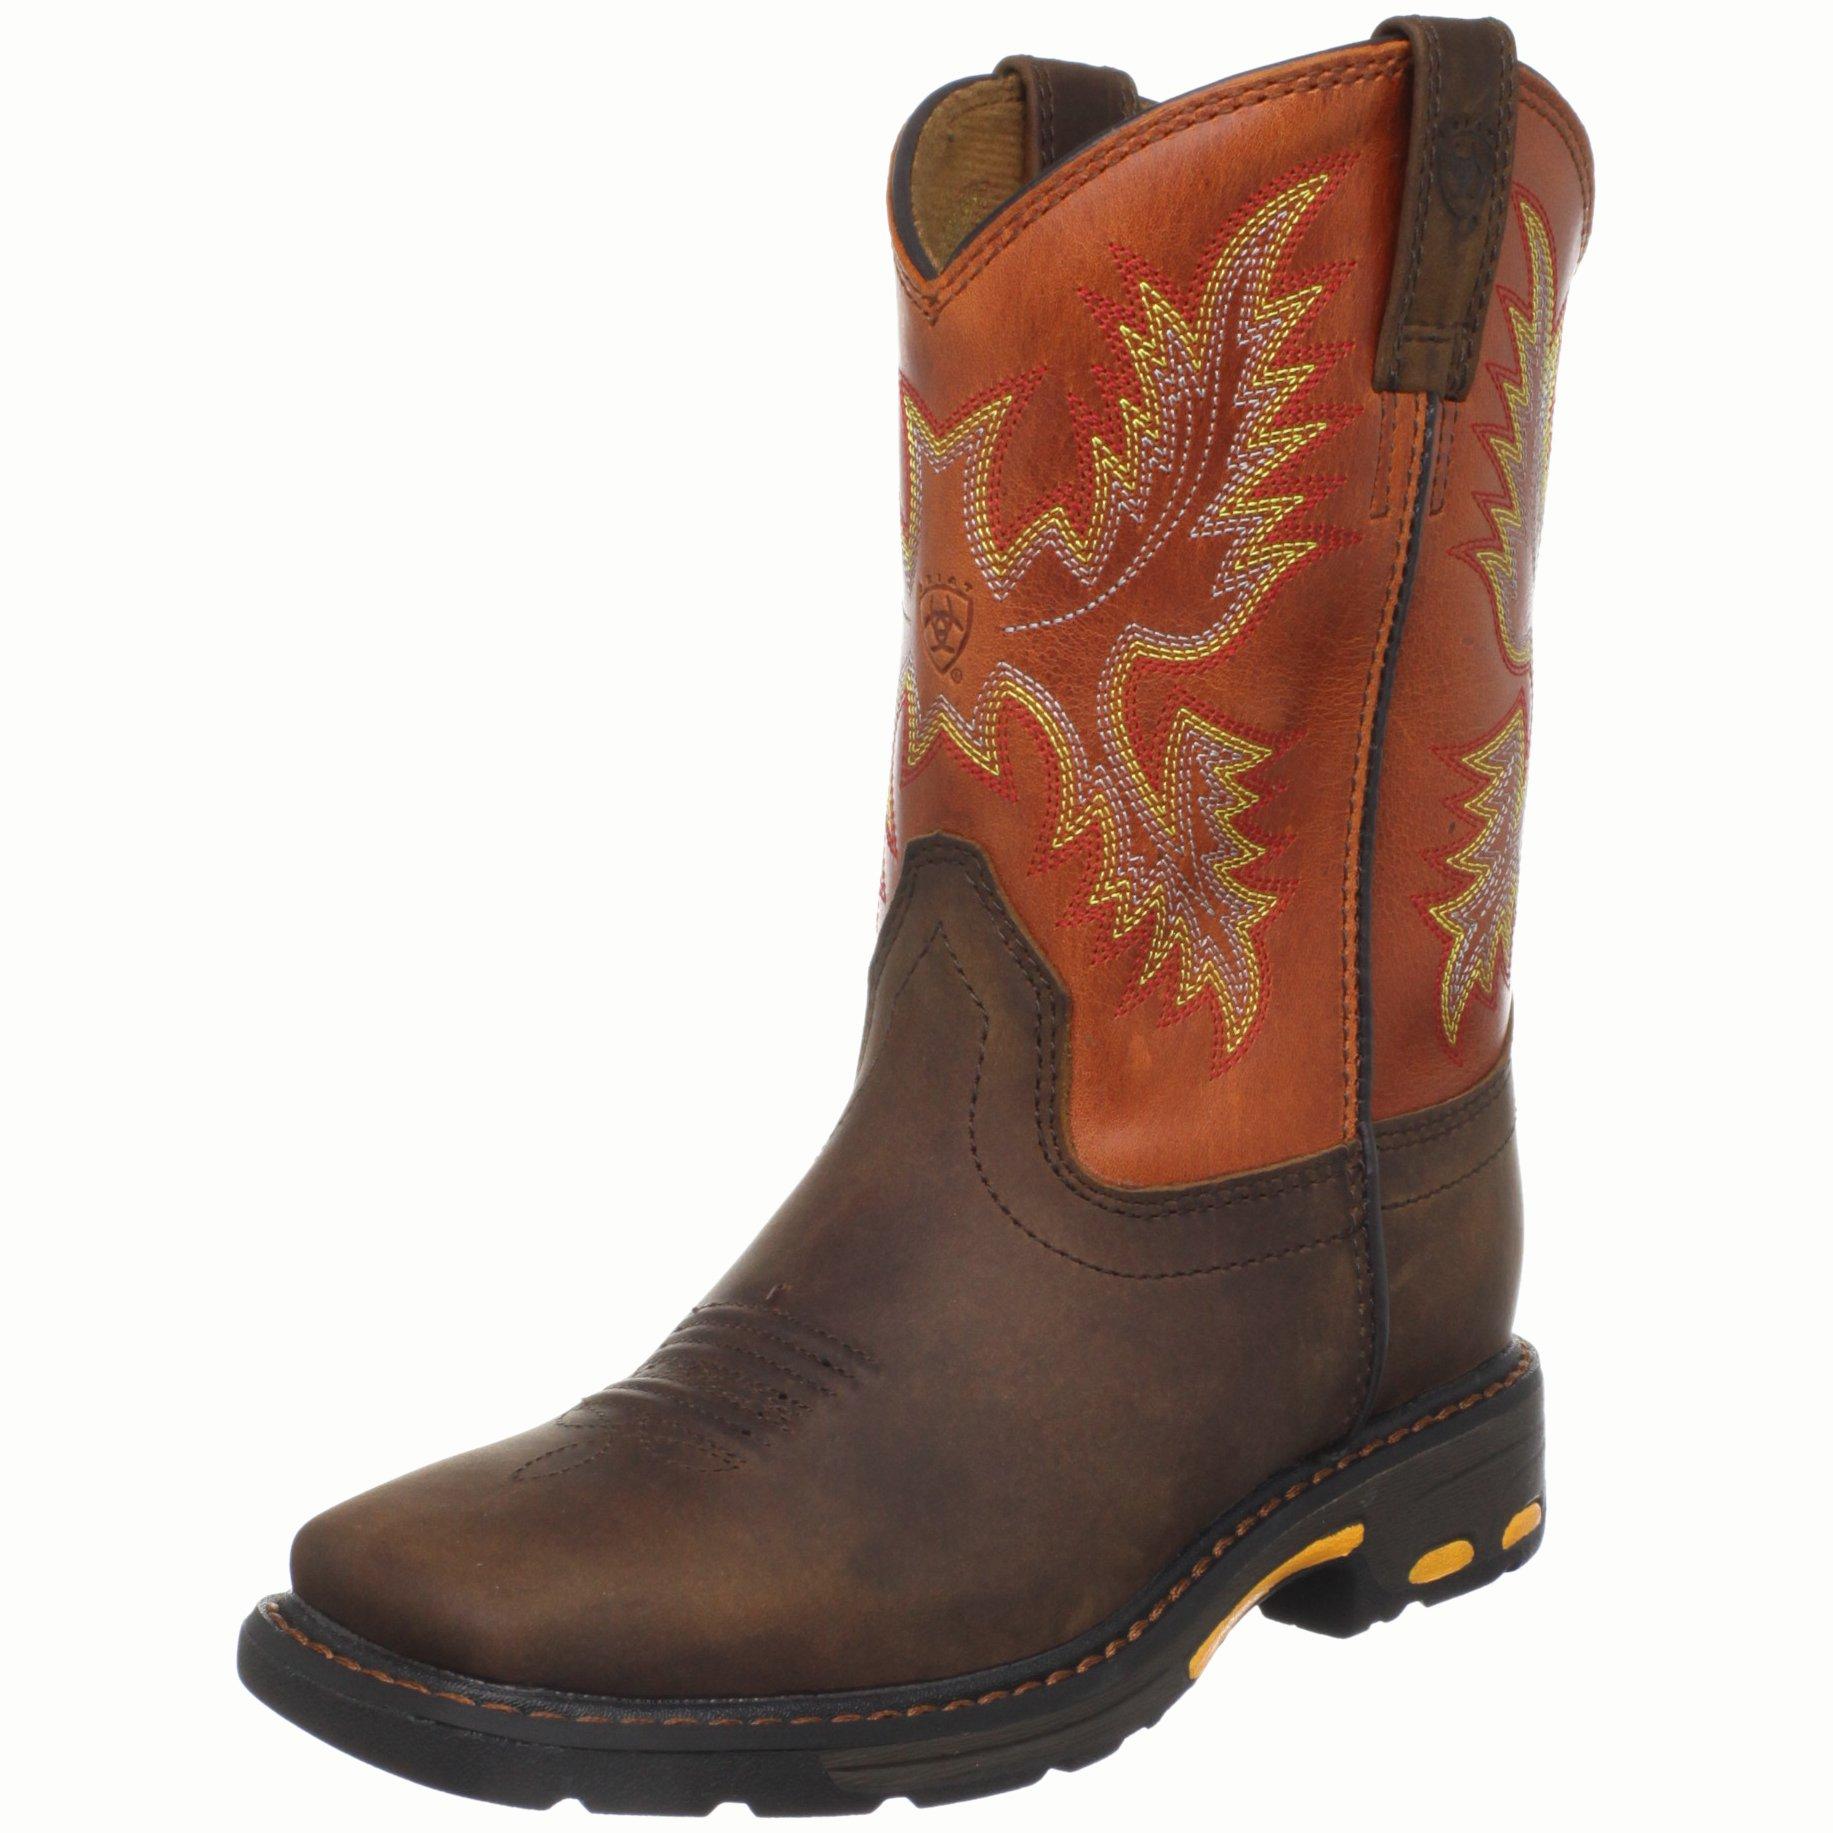 Kids' Workhog Wide Square Toe Western Cowboy Boot, Dark Earth/Brick, 9.5 M US Toddler